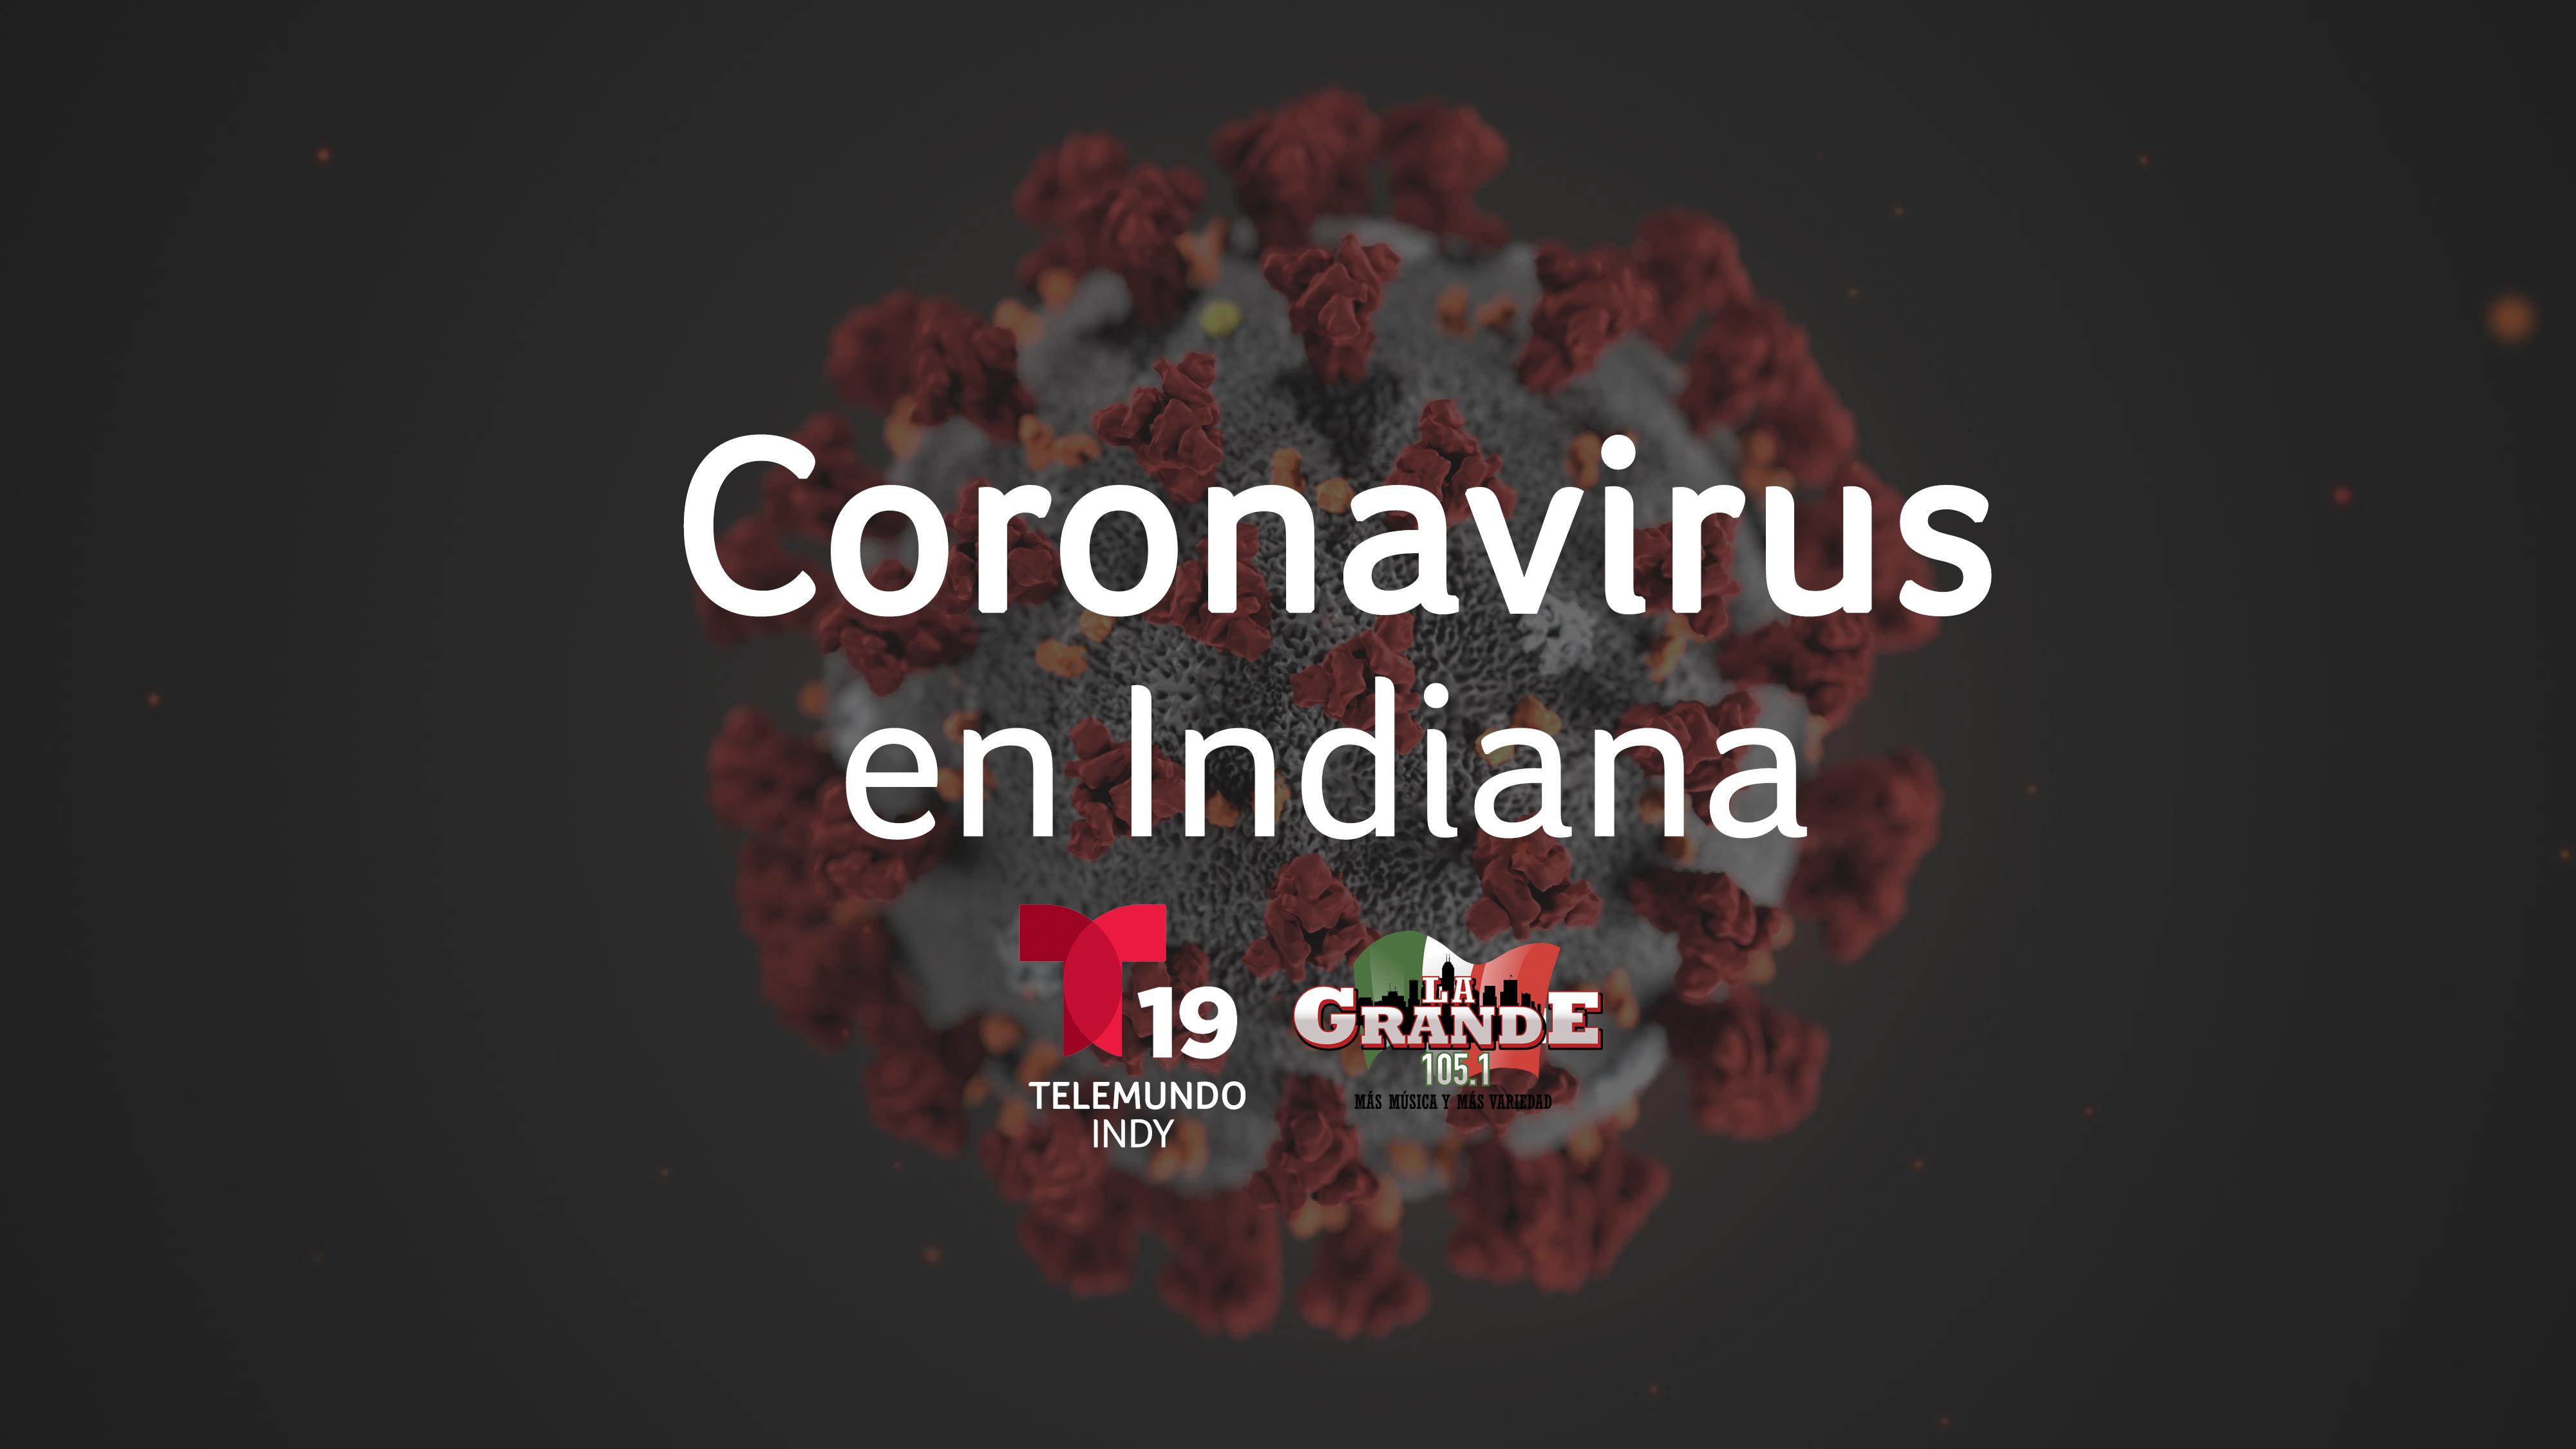 Coronavirus en Indiana